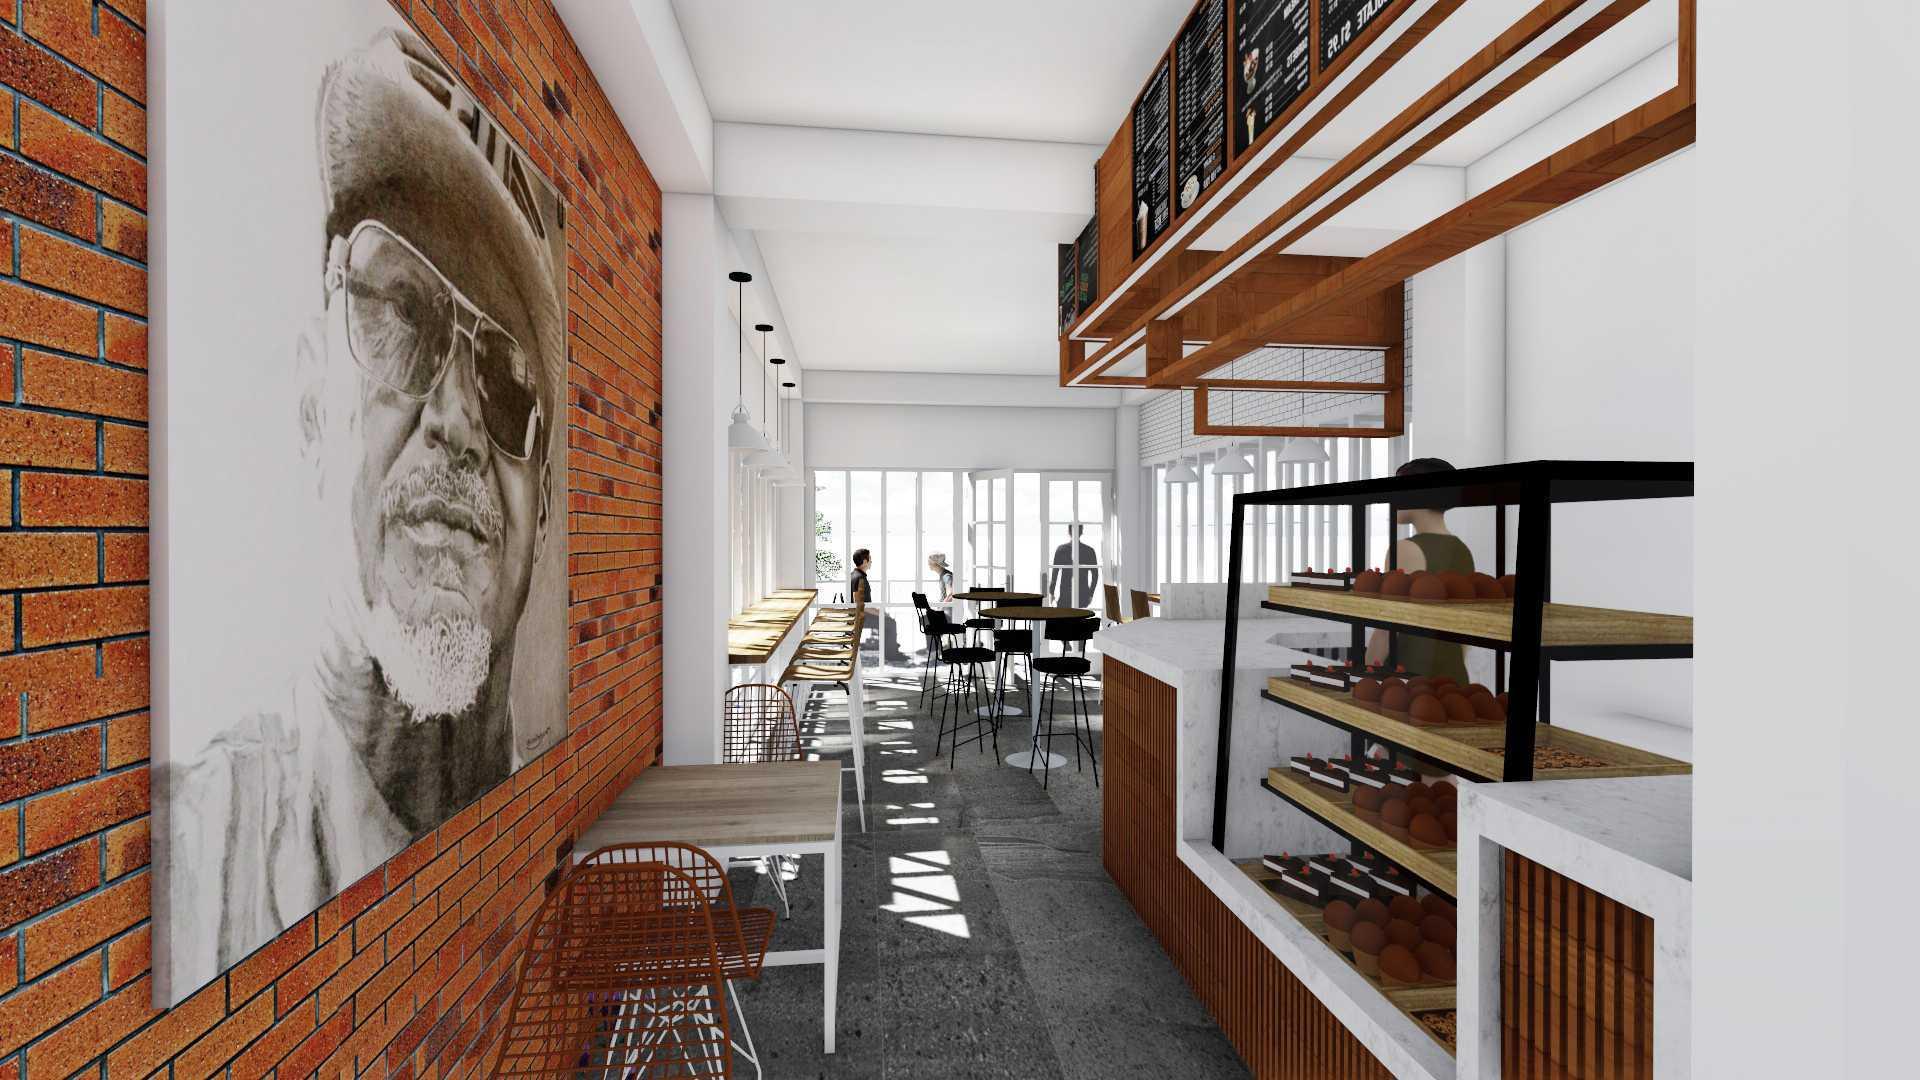 Astabumi Architect & Interior Design Institut Kopi Tegal Tegal, Kota Tegal, Jawa Tengah, Indonesia Tegal, Kota Tegal, Jawa Tengah, Indonesia Astabumi-Architect-Interior-Design-Institut-Kopi-Tegal   83520